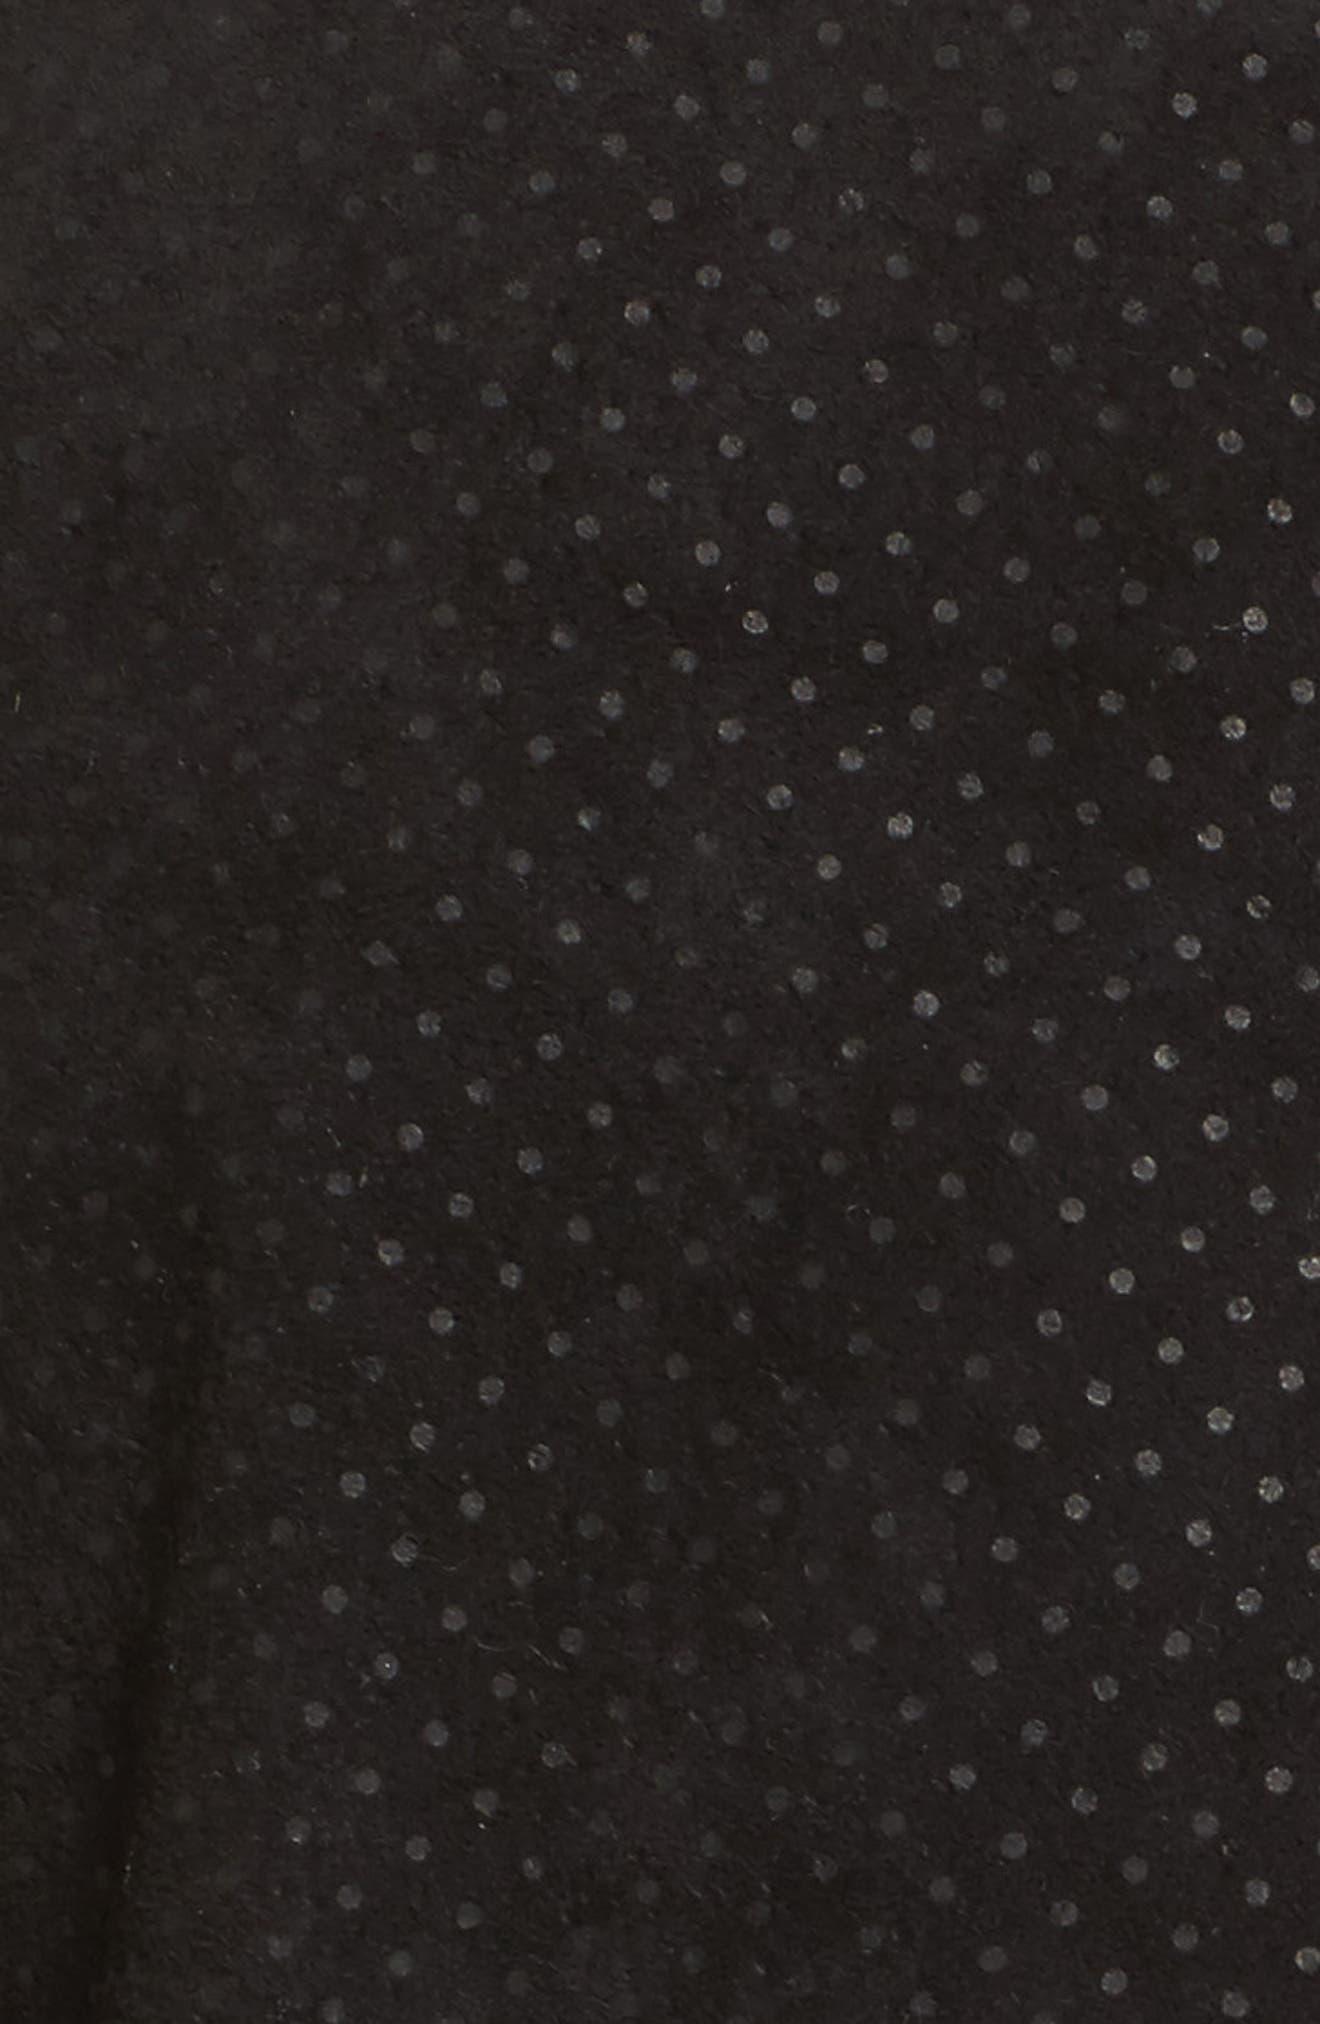 Motorin Suede Jacket,                             Alternate thumbnail 6, color,                             Black